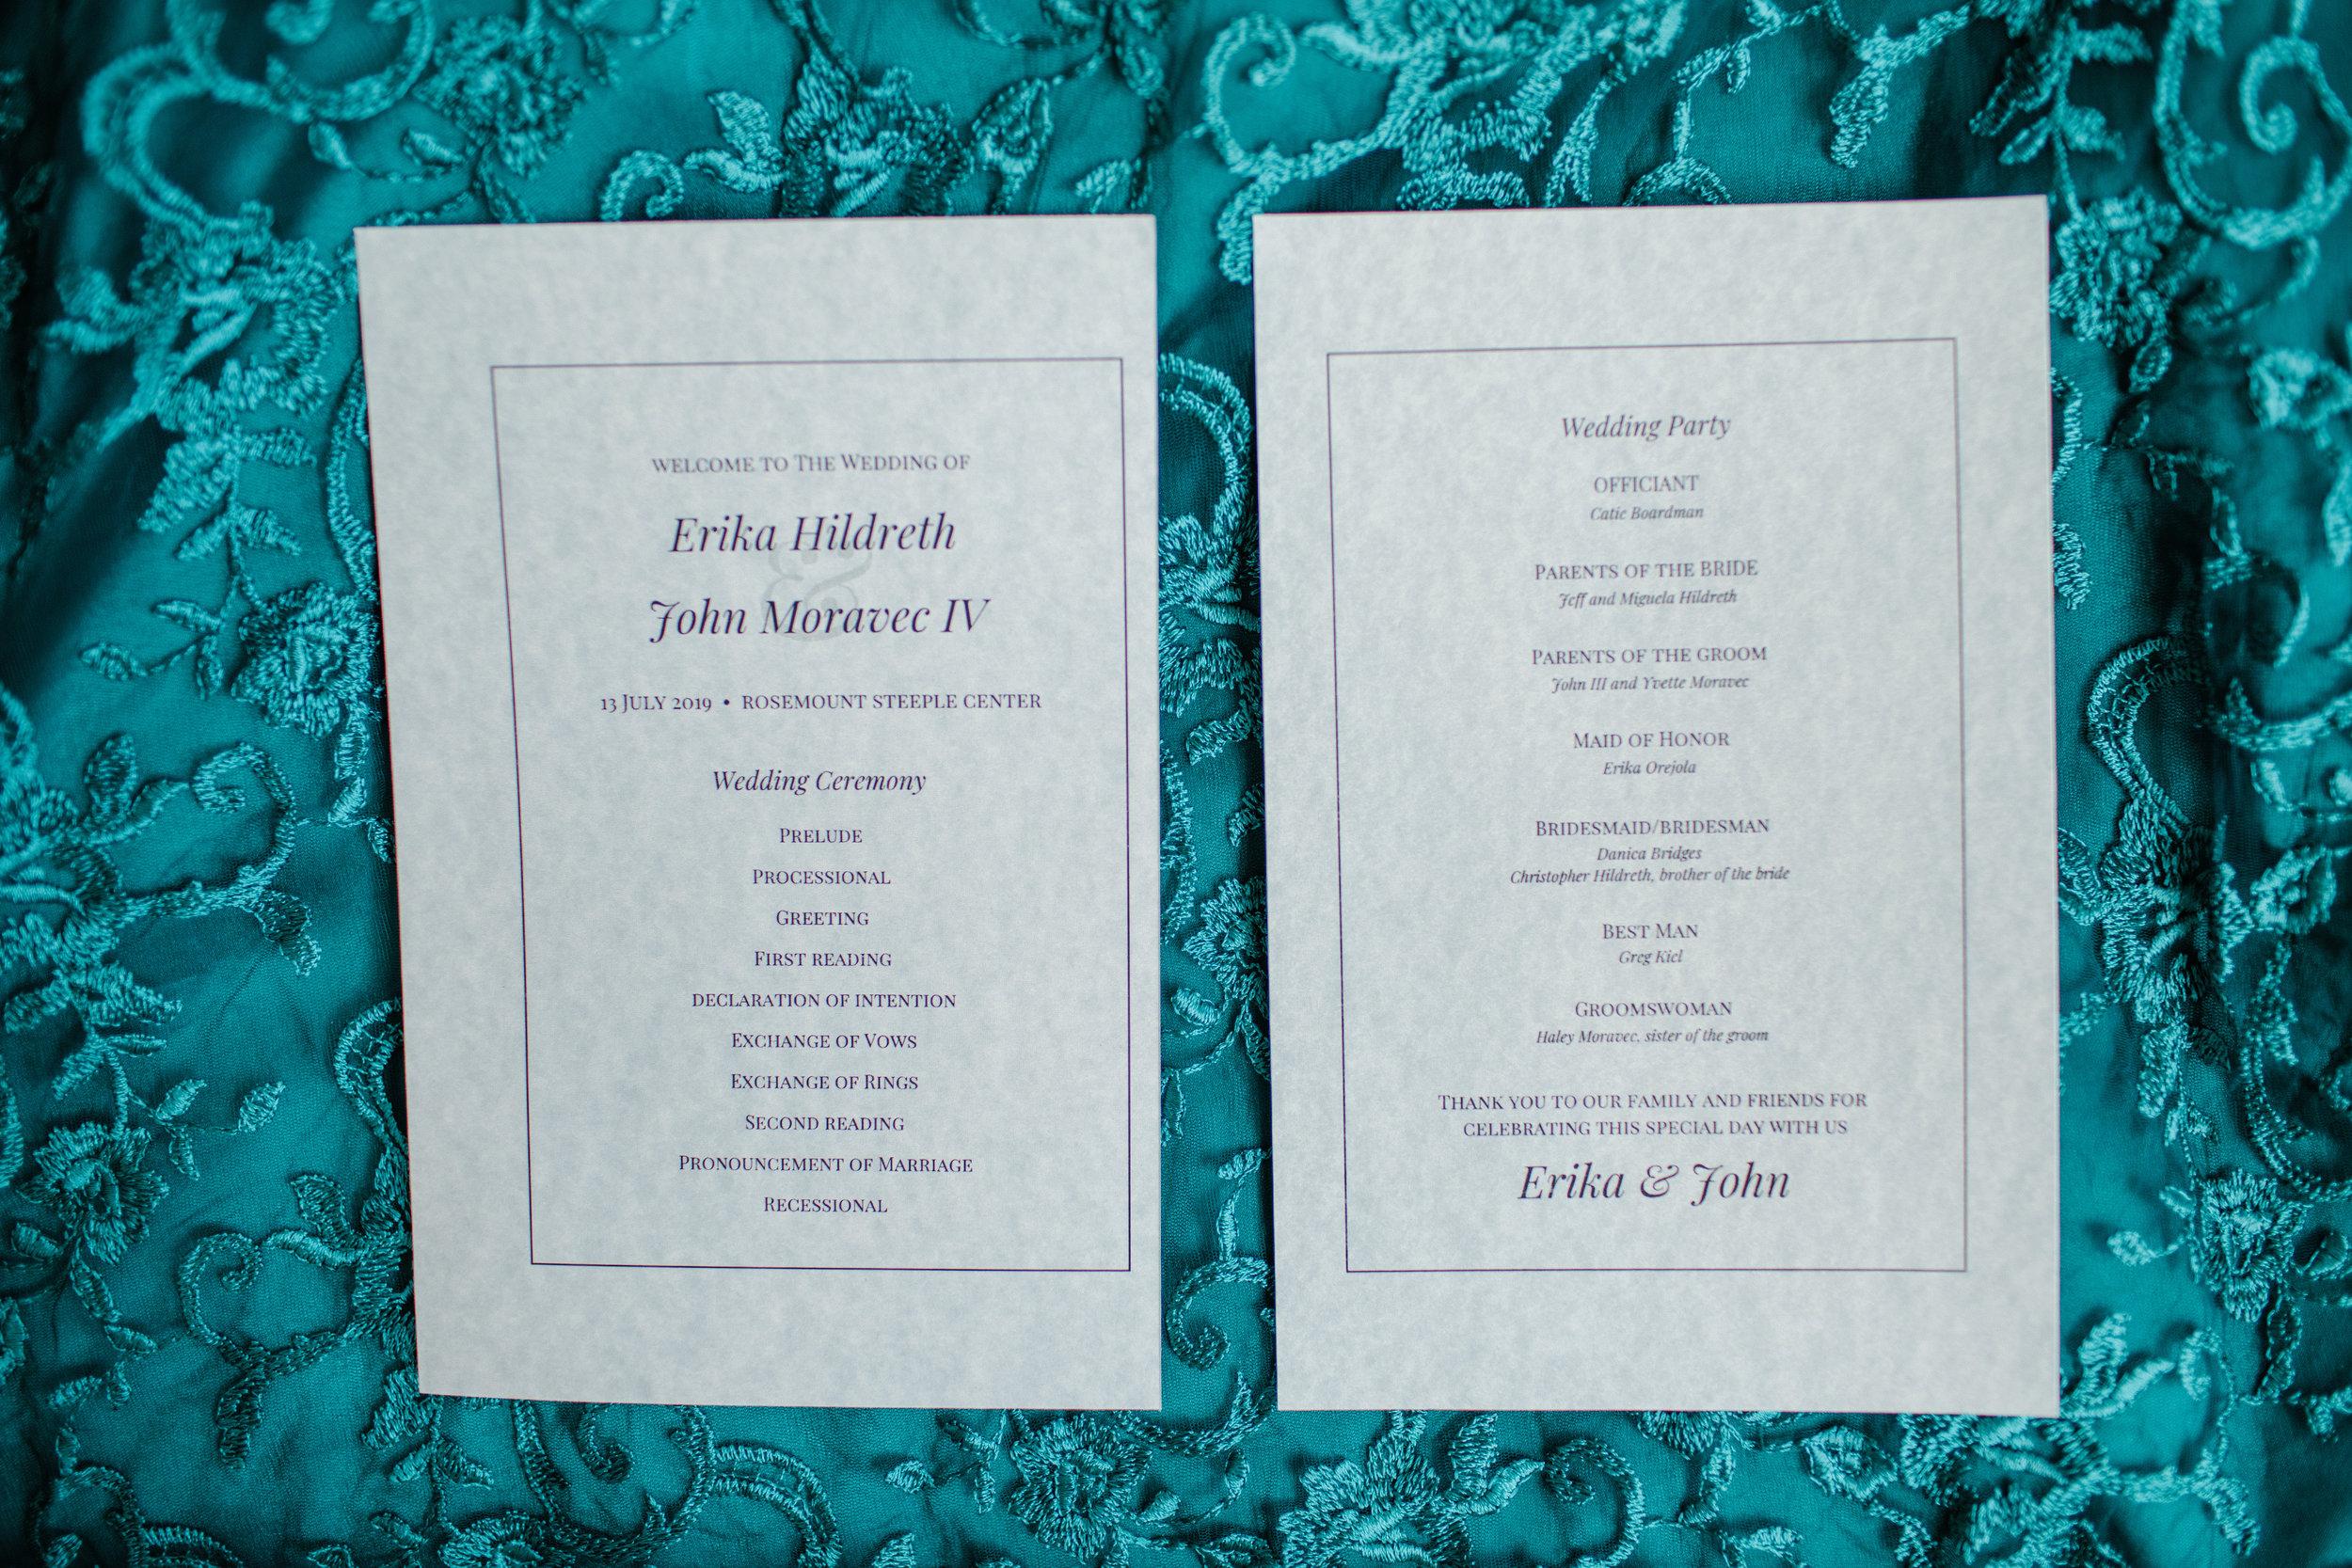 minnesota-Wedding-5.jpg